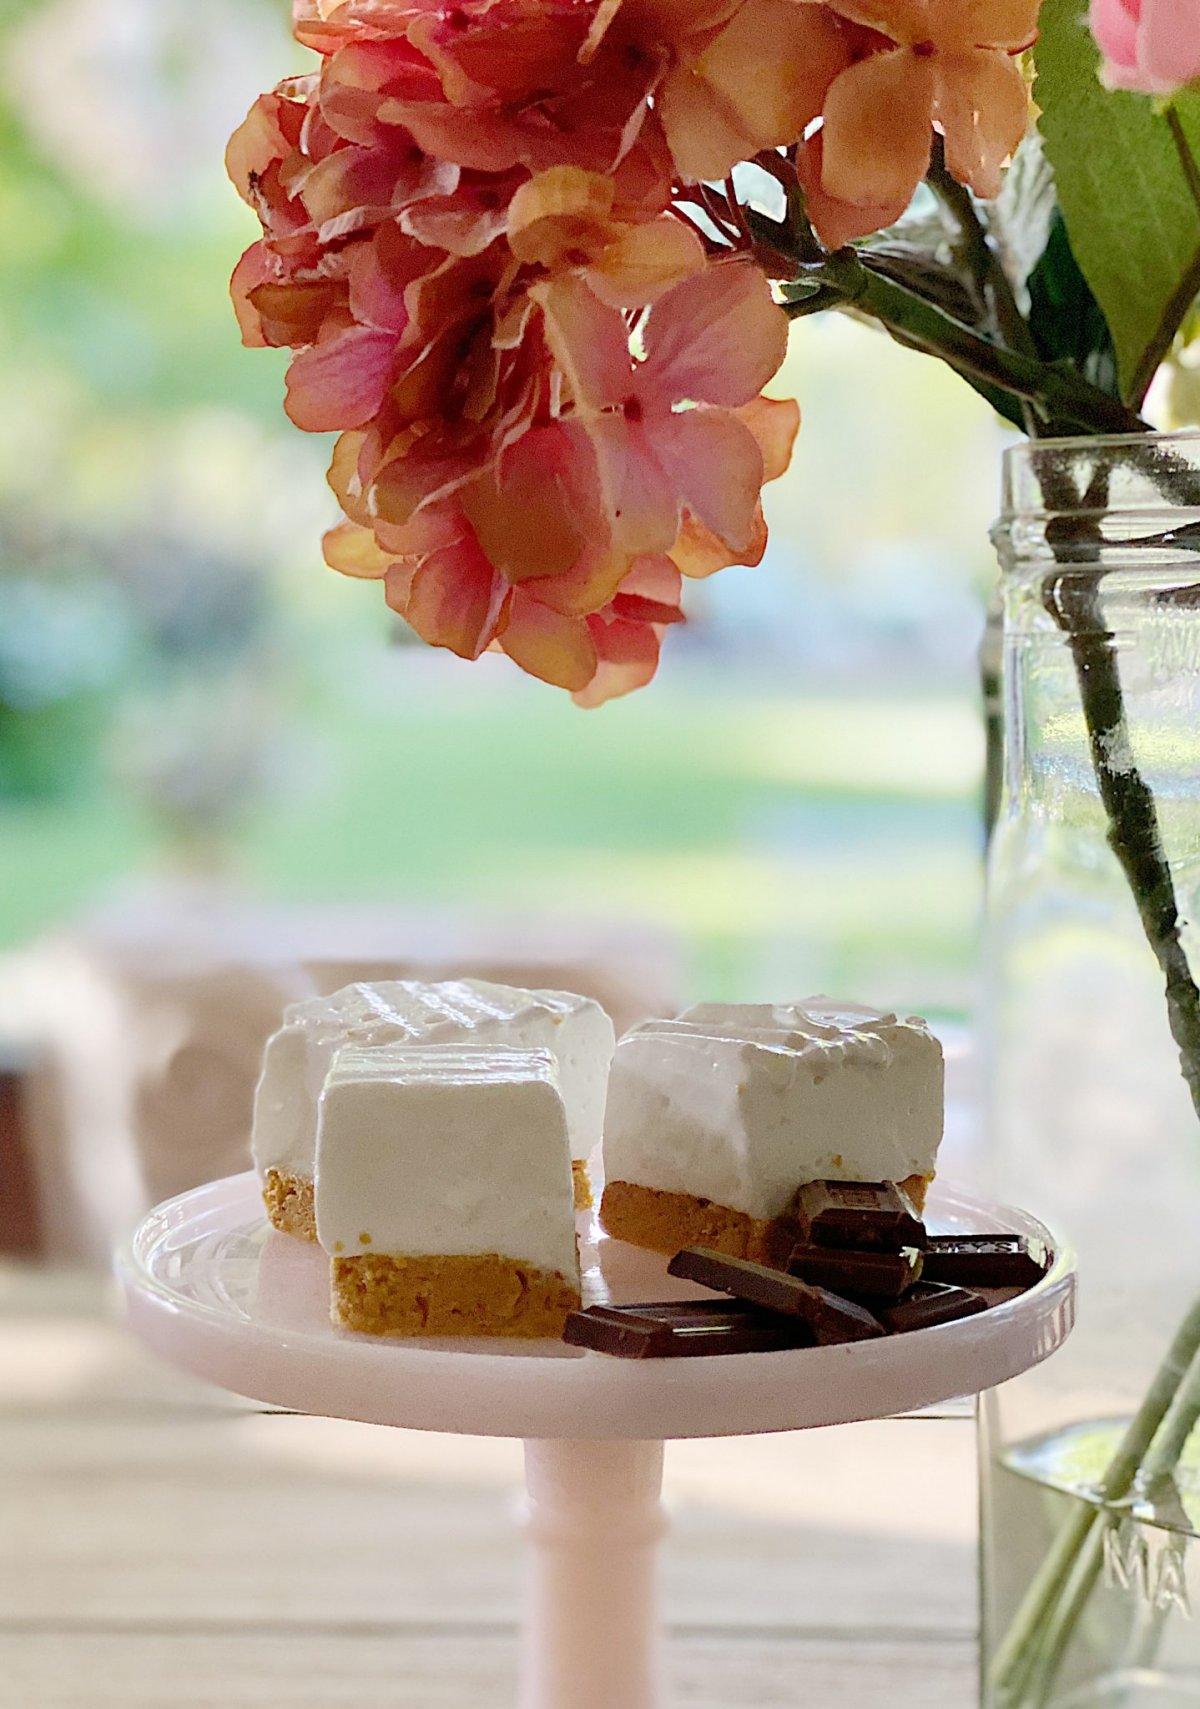 marshmallow smores recipe